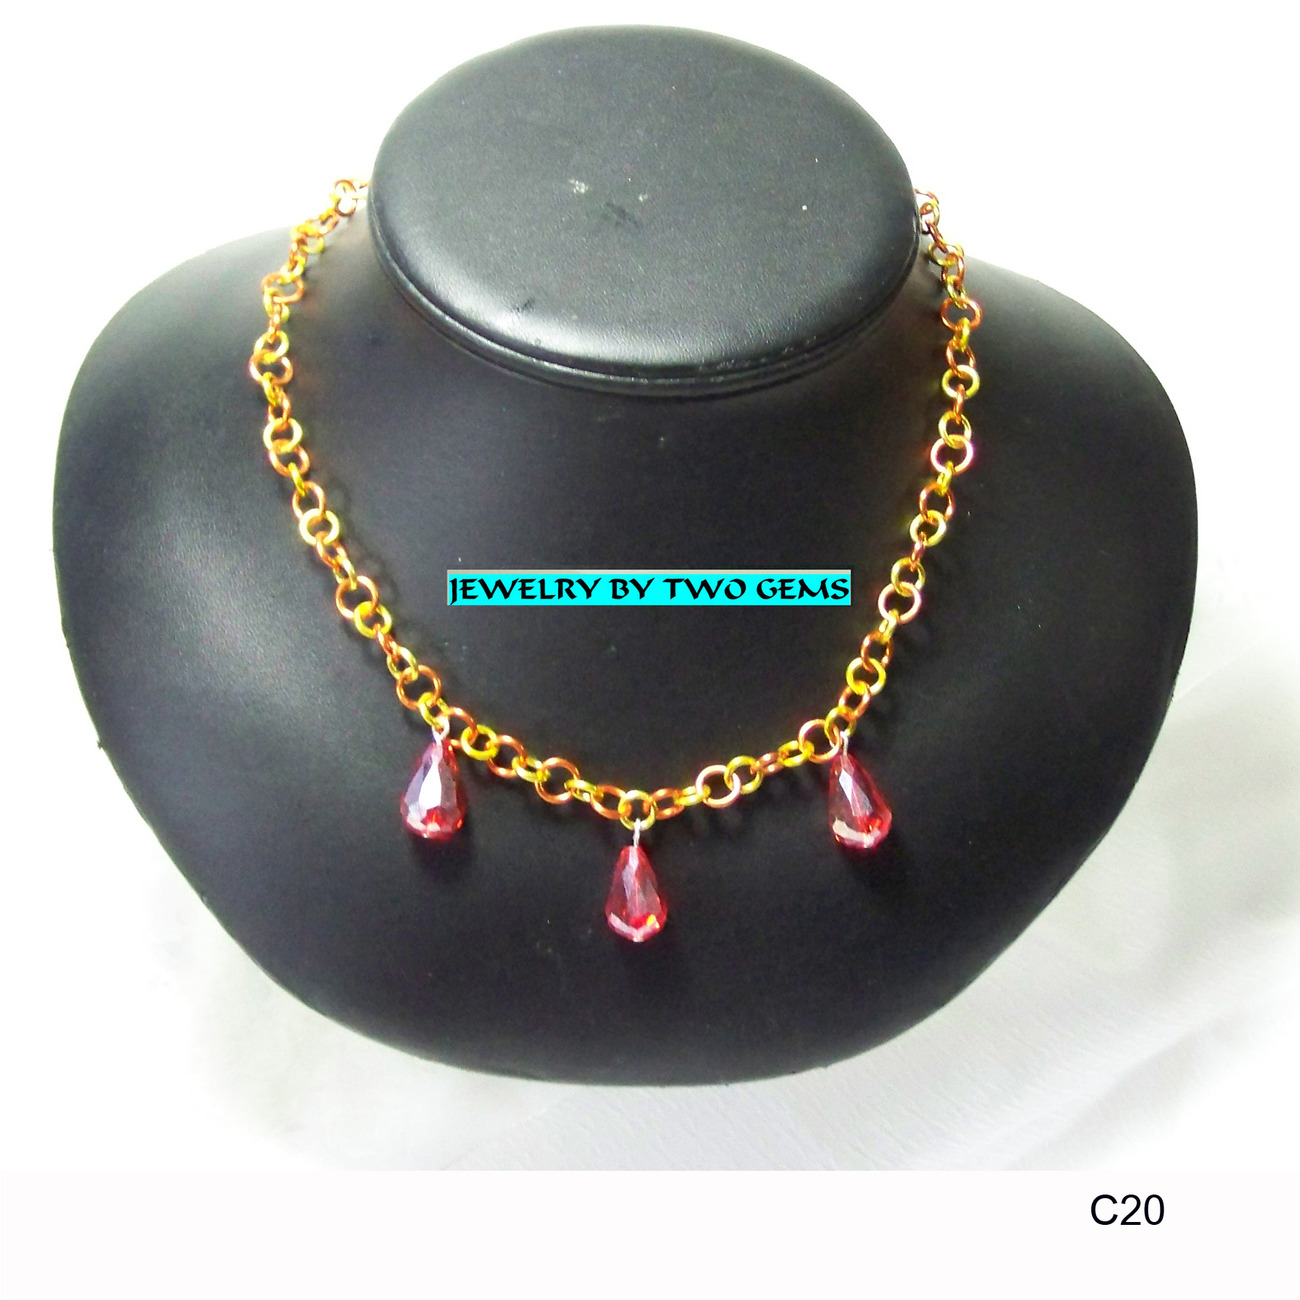 Jewelry By Two Gems (C20) Yellow/Orange Aluminum Necklace w Orange Crystals